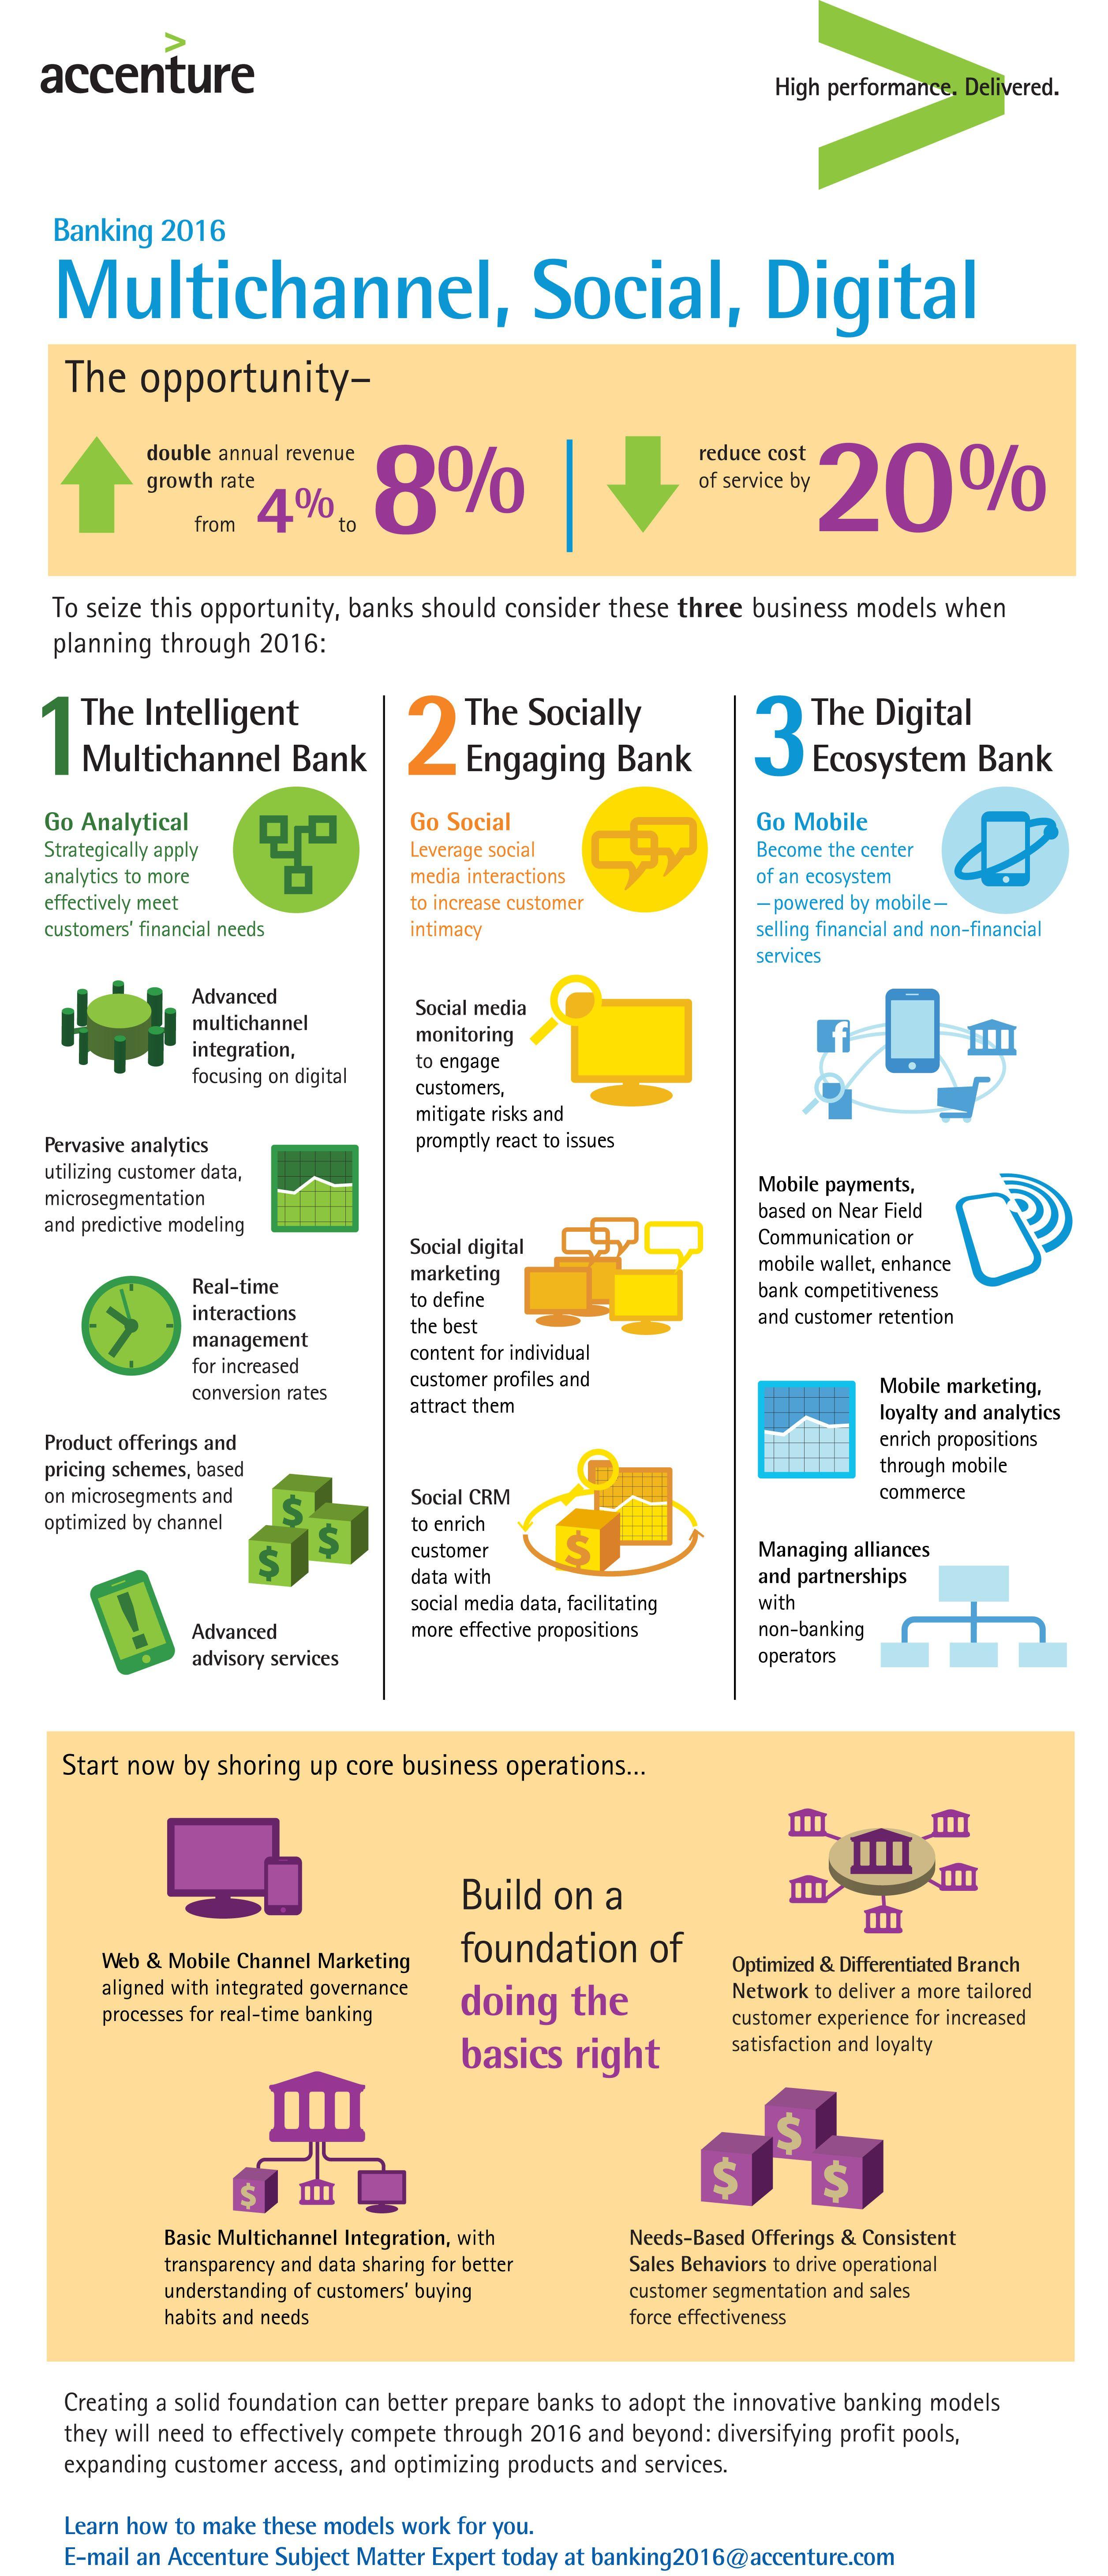 ACCENTURE BANKING 2016 EPUB